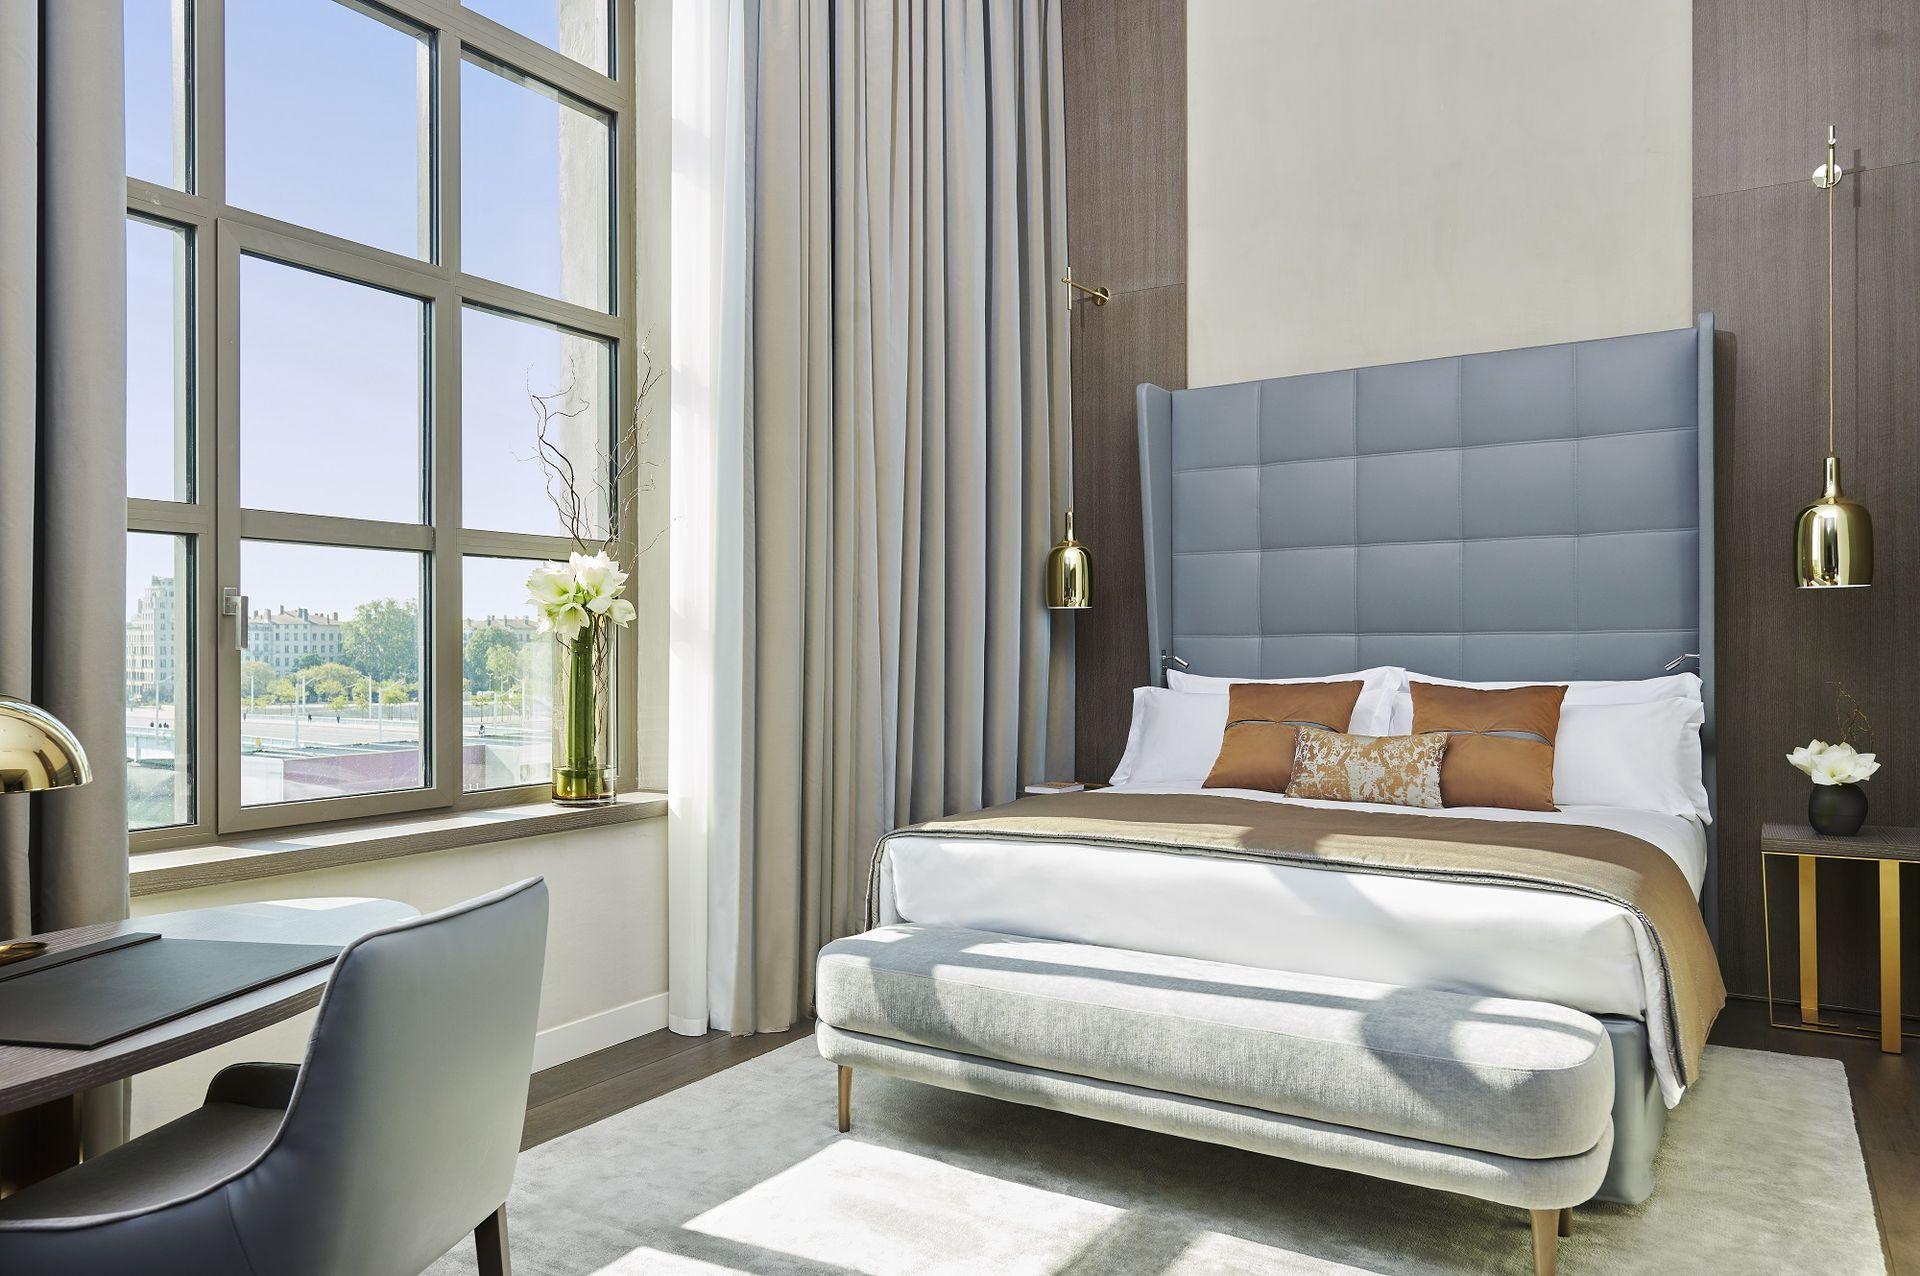 InterContinental Lyon Hotel Dieu Executive Room River View (c) Eric Cuvillier (2)